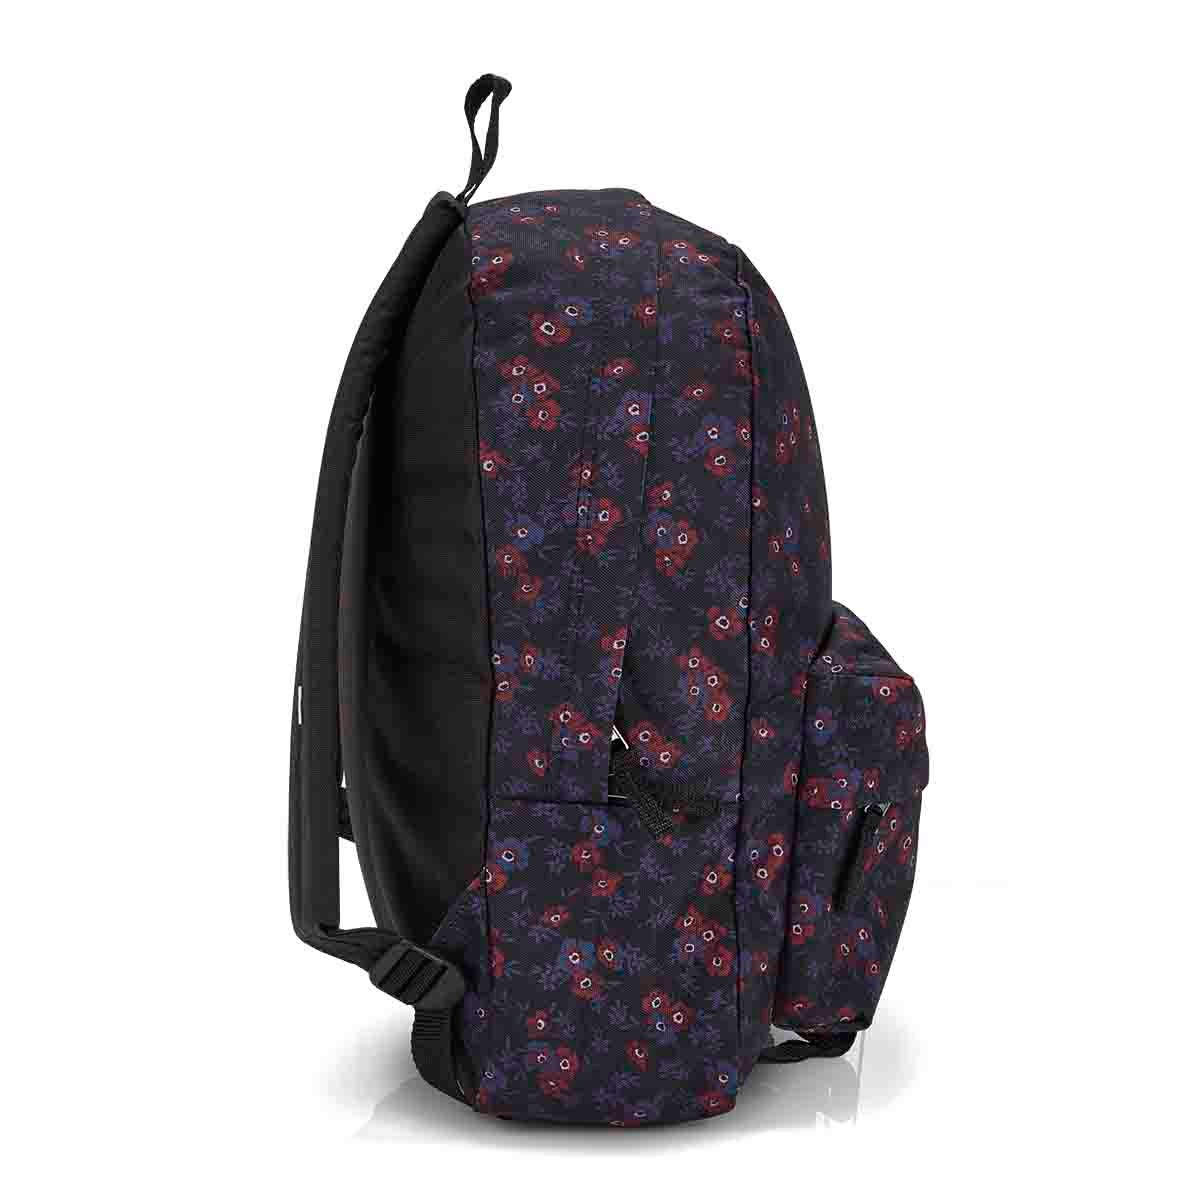 Vans Realm Classic black blooms backpack